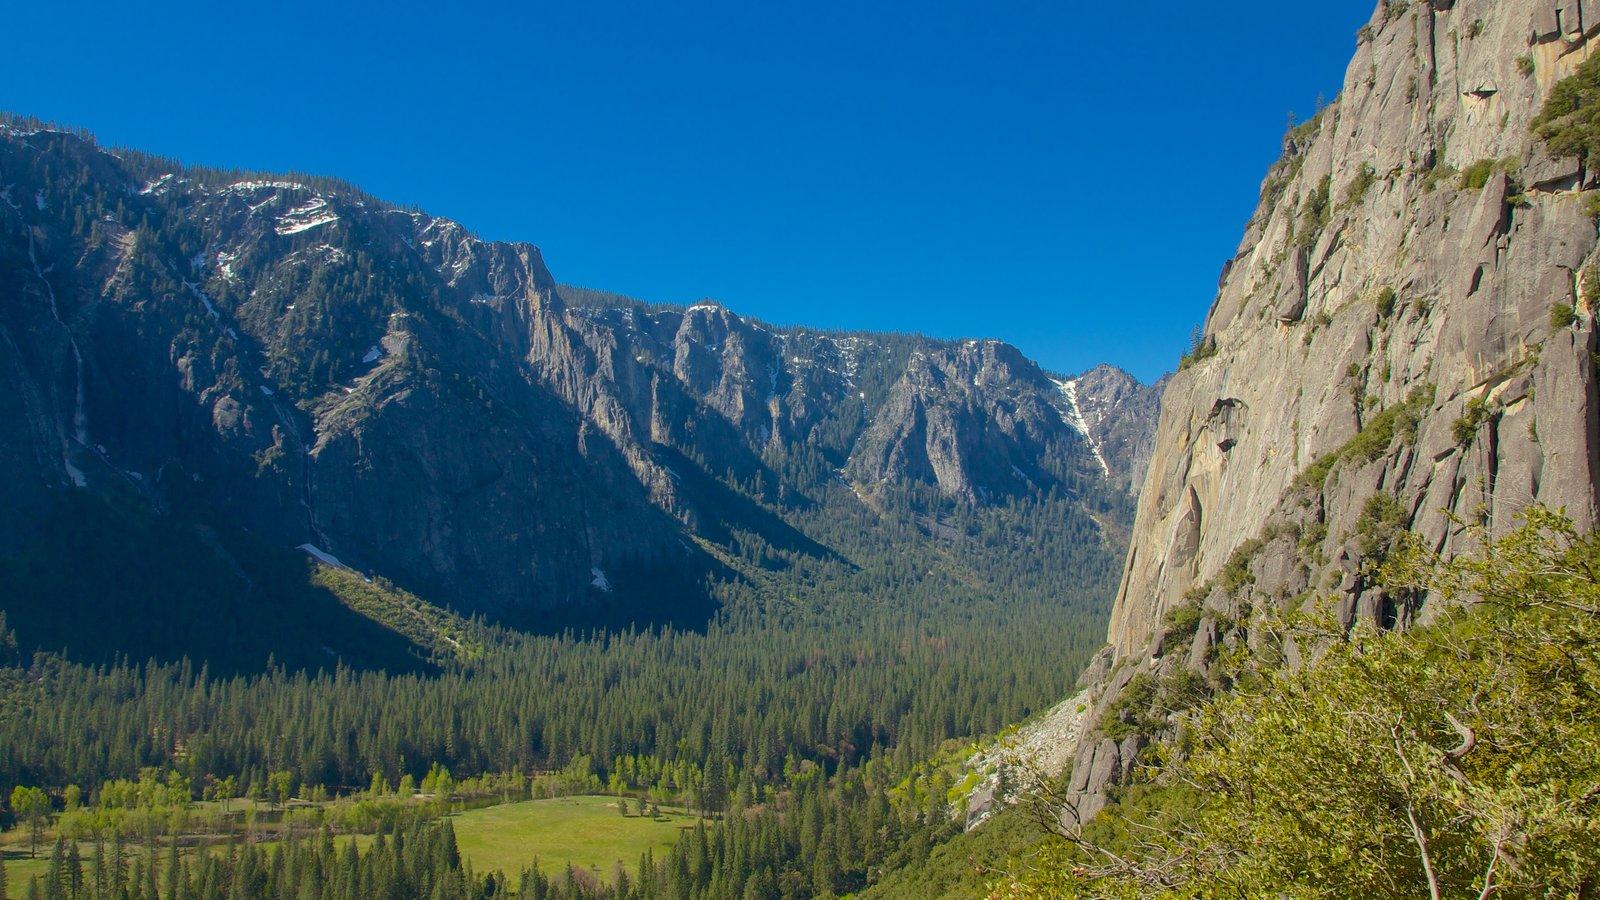 Yosemite Valley caracterizando montanhas